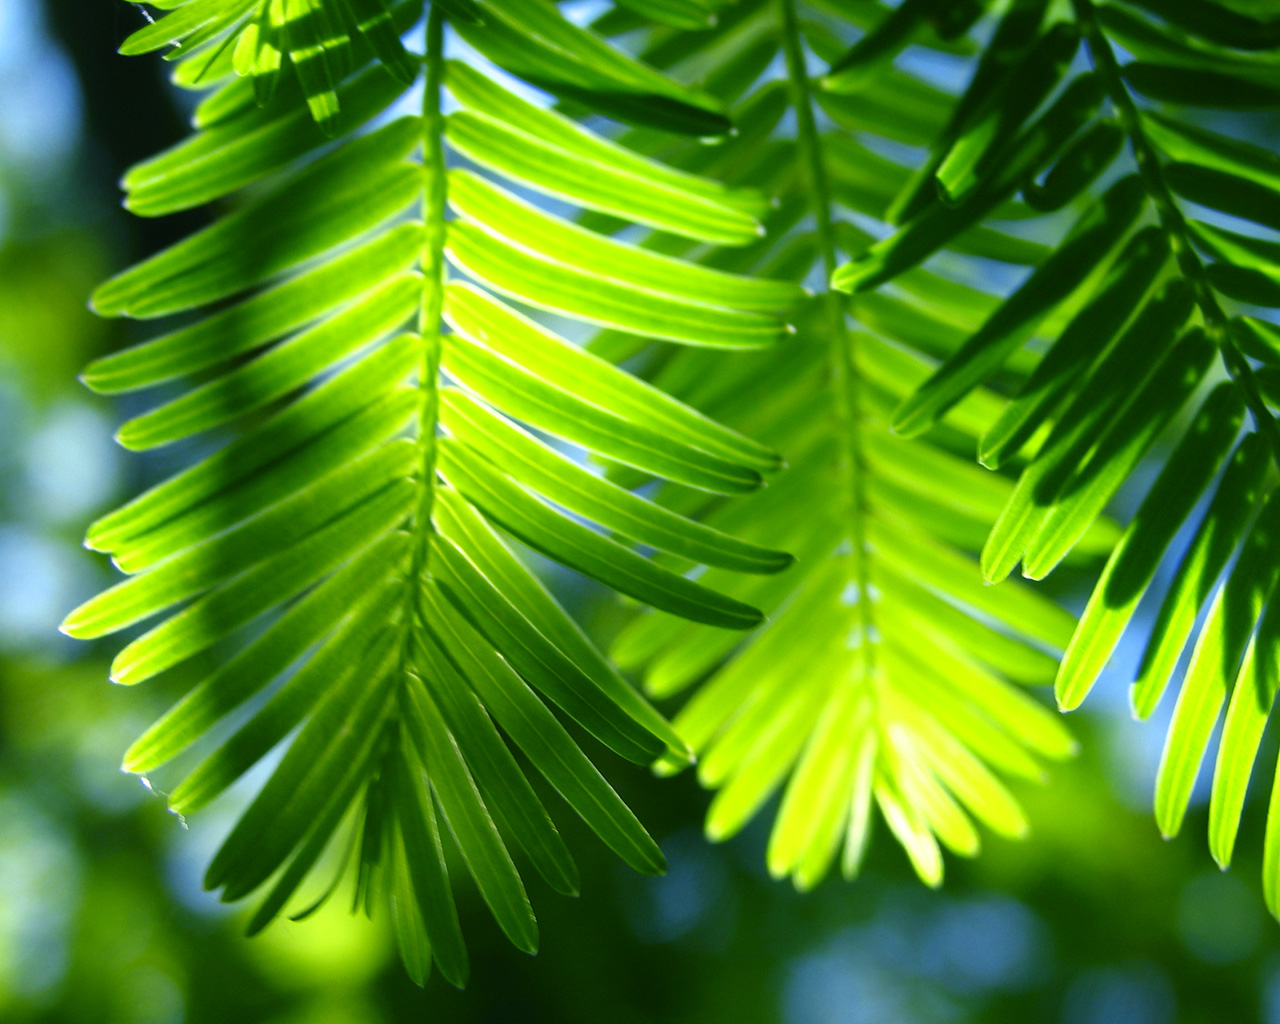 http://4.bp.blogspot.com/-LUXfPU_Wez4/TgnHhDYD09I/AAAAAAAAAbA/C-3Wsbz5UX0/s1600/tropicalparadise1280x1024.jpg